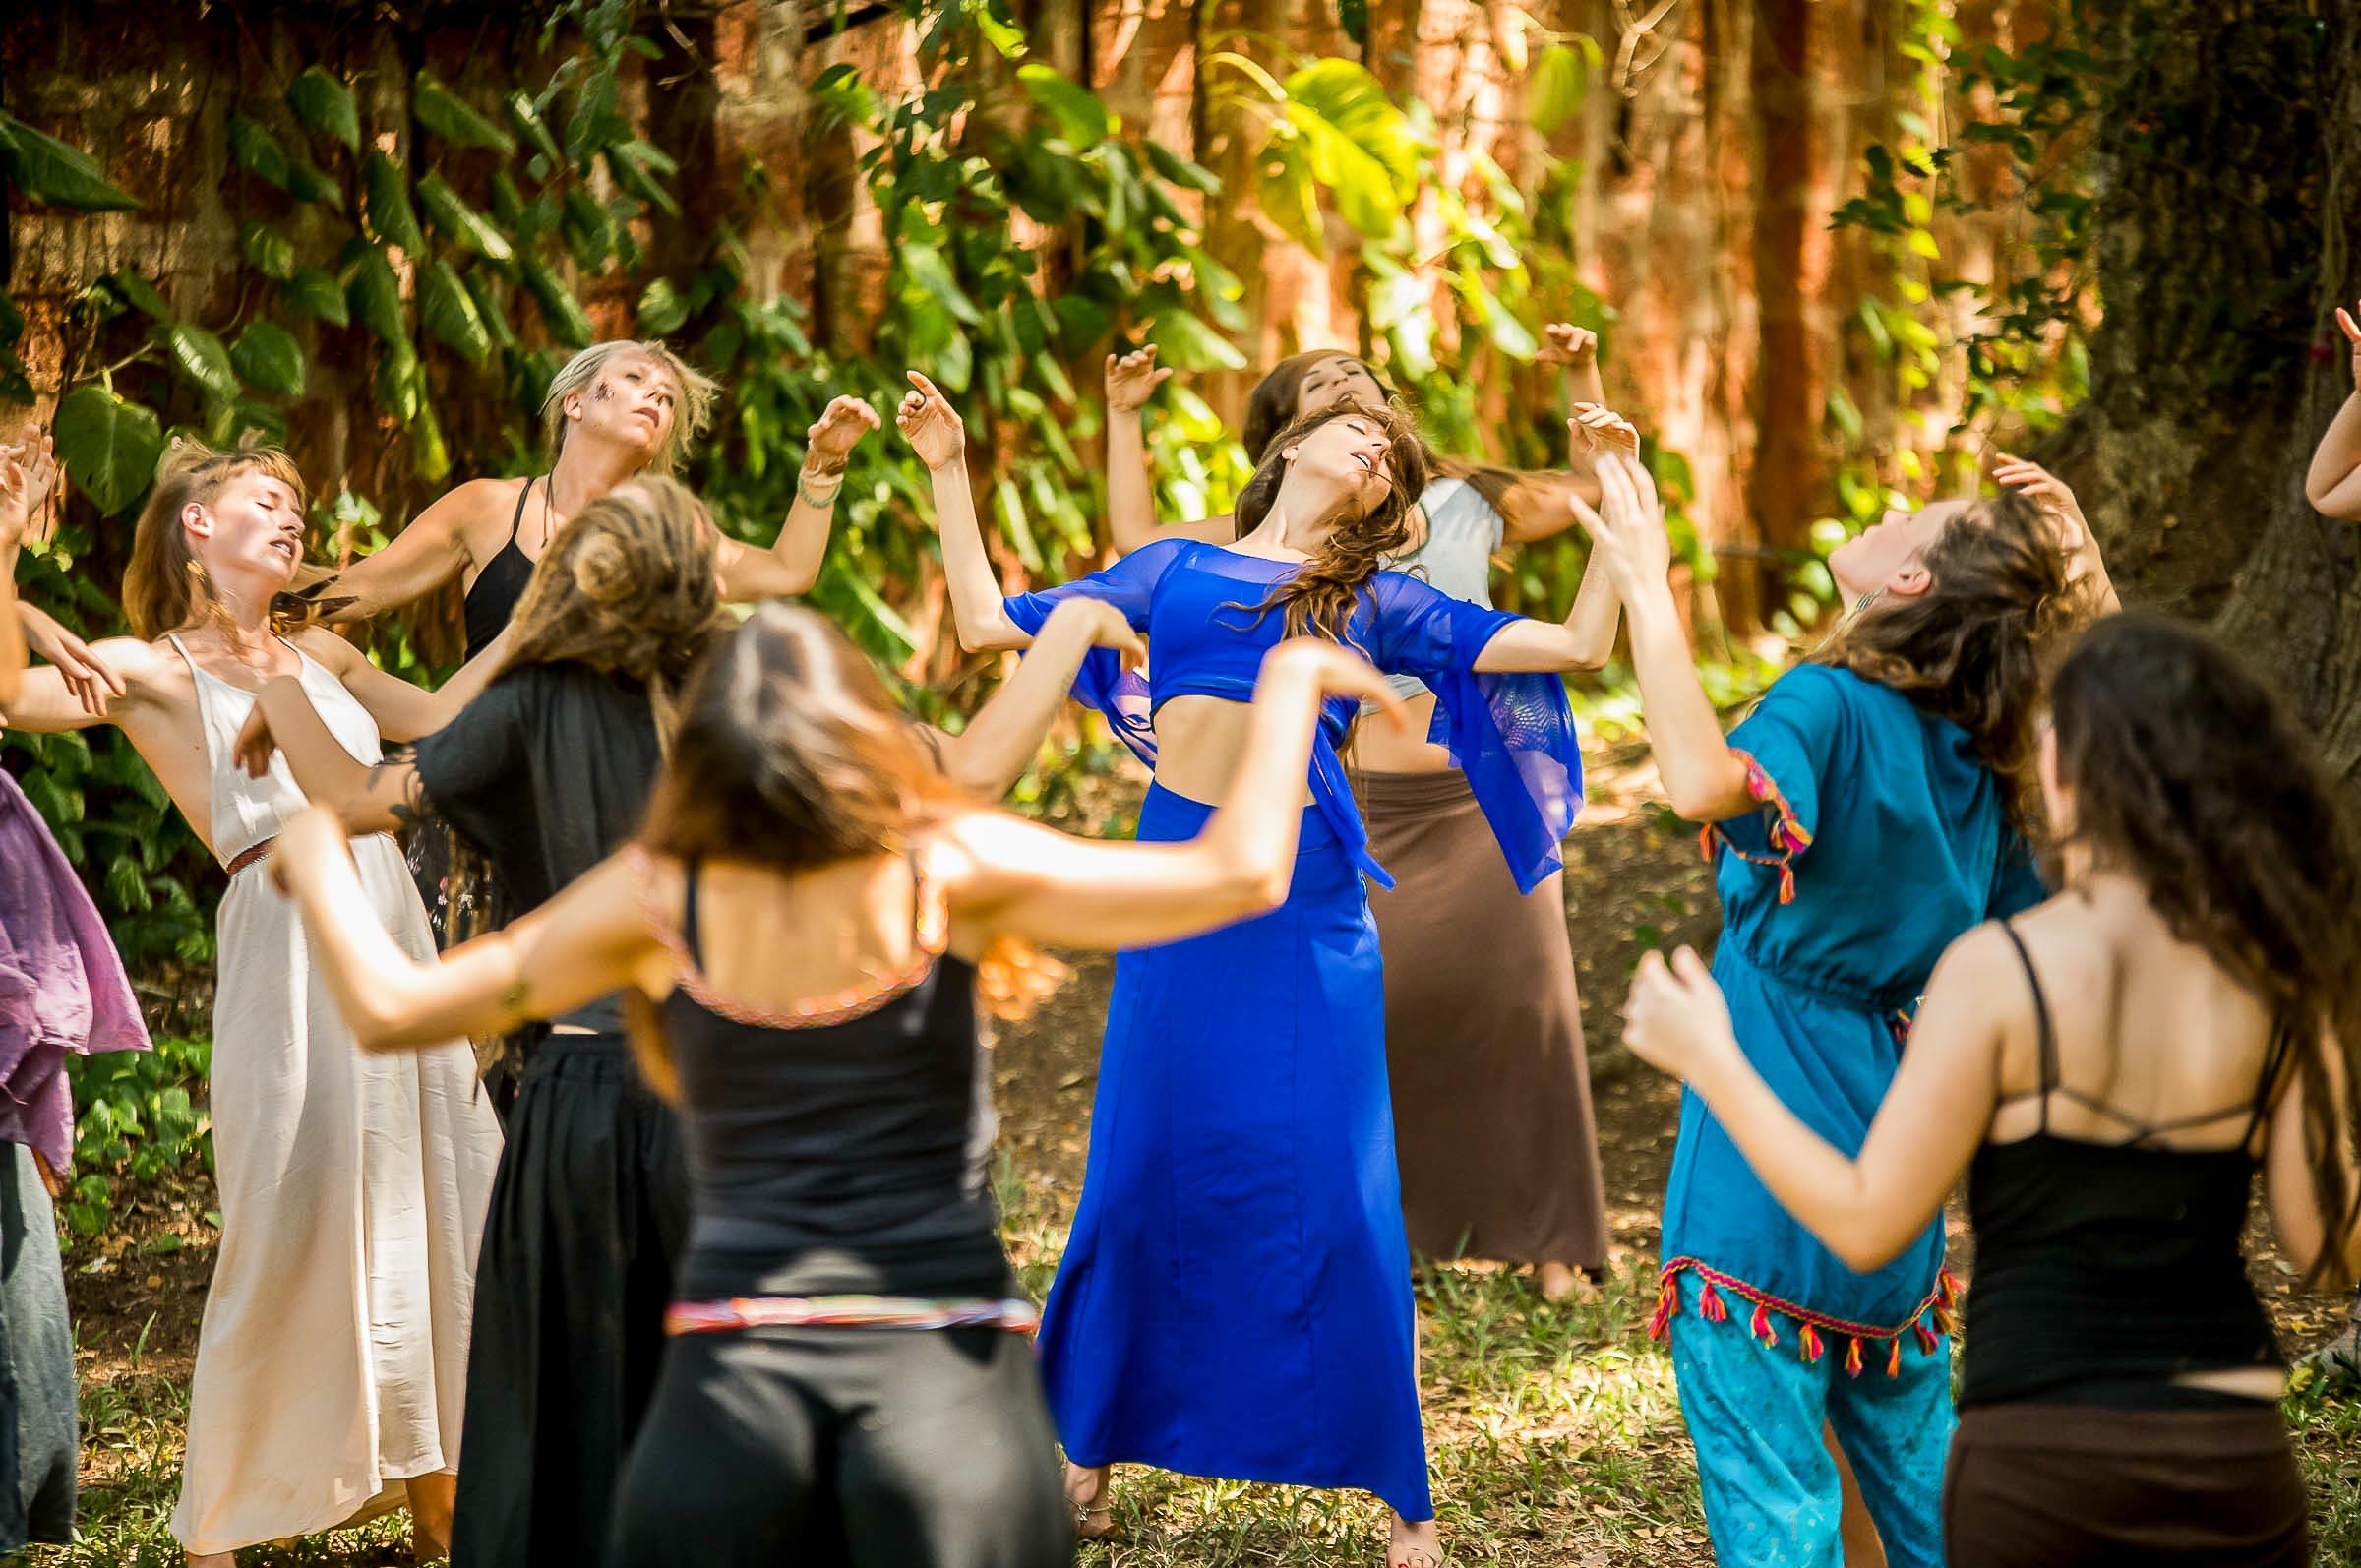 Dance & Yoga Intense Workshop Retreat with Zola Dubnikova  in India captured by the International Portrait Photographer - Magdalena Smolarska Photography based in UK